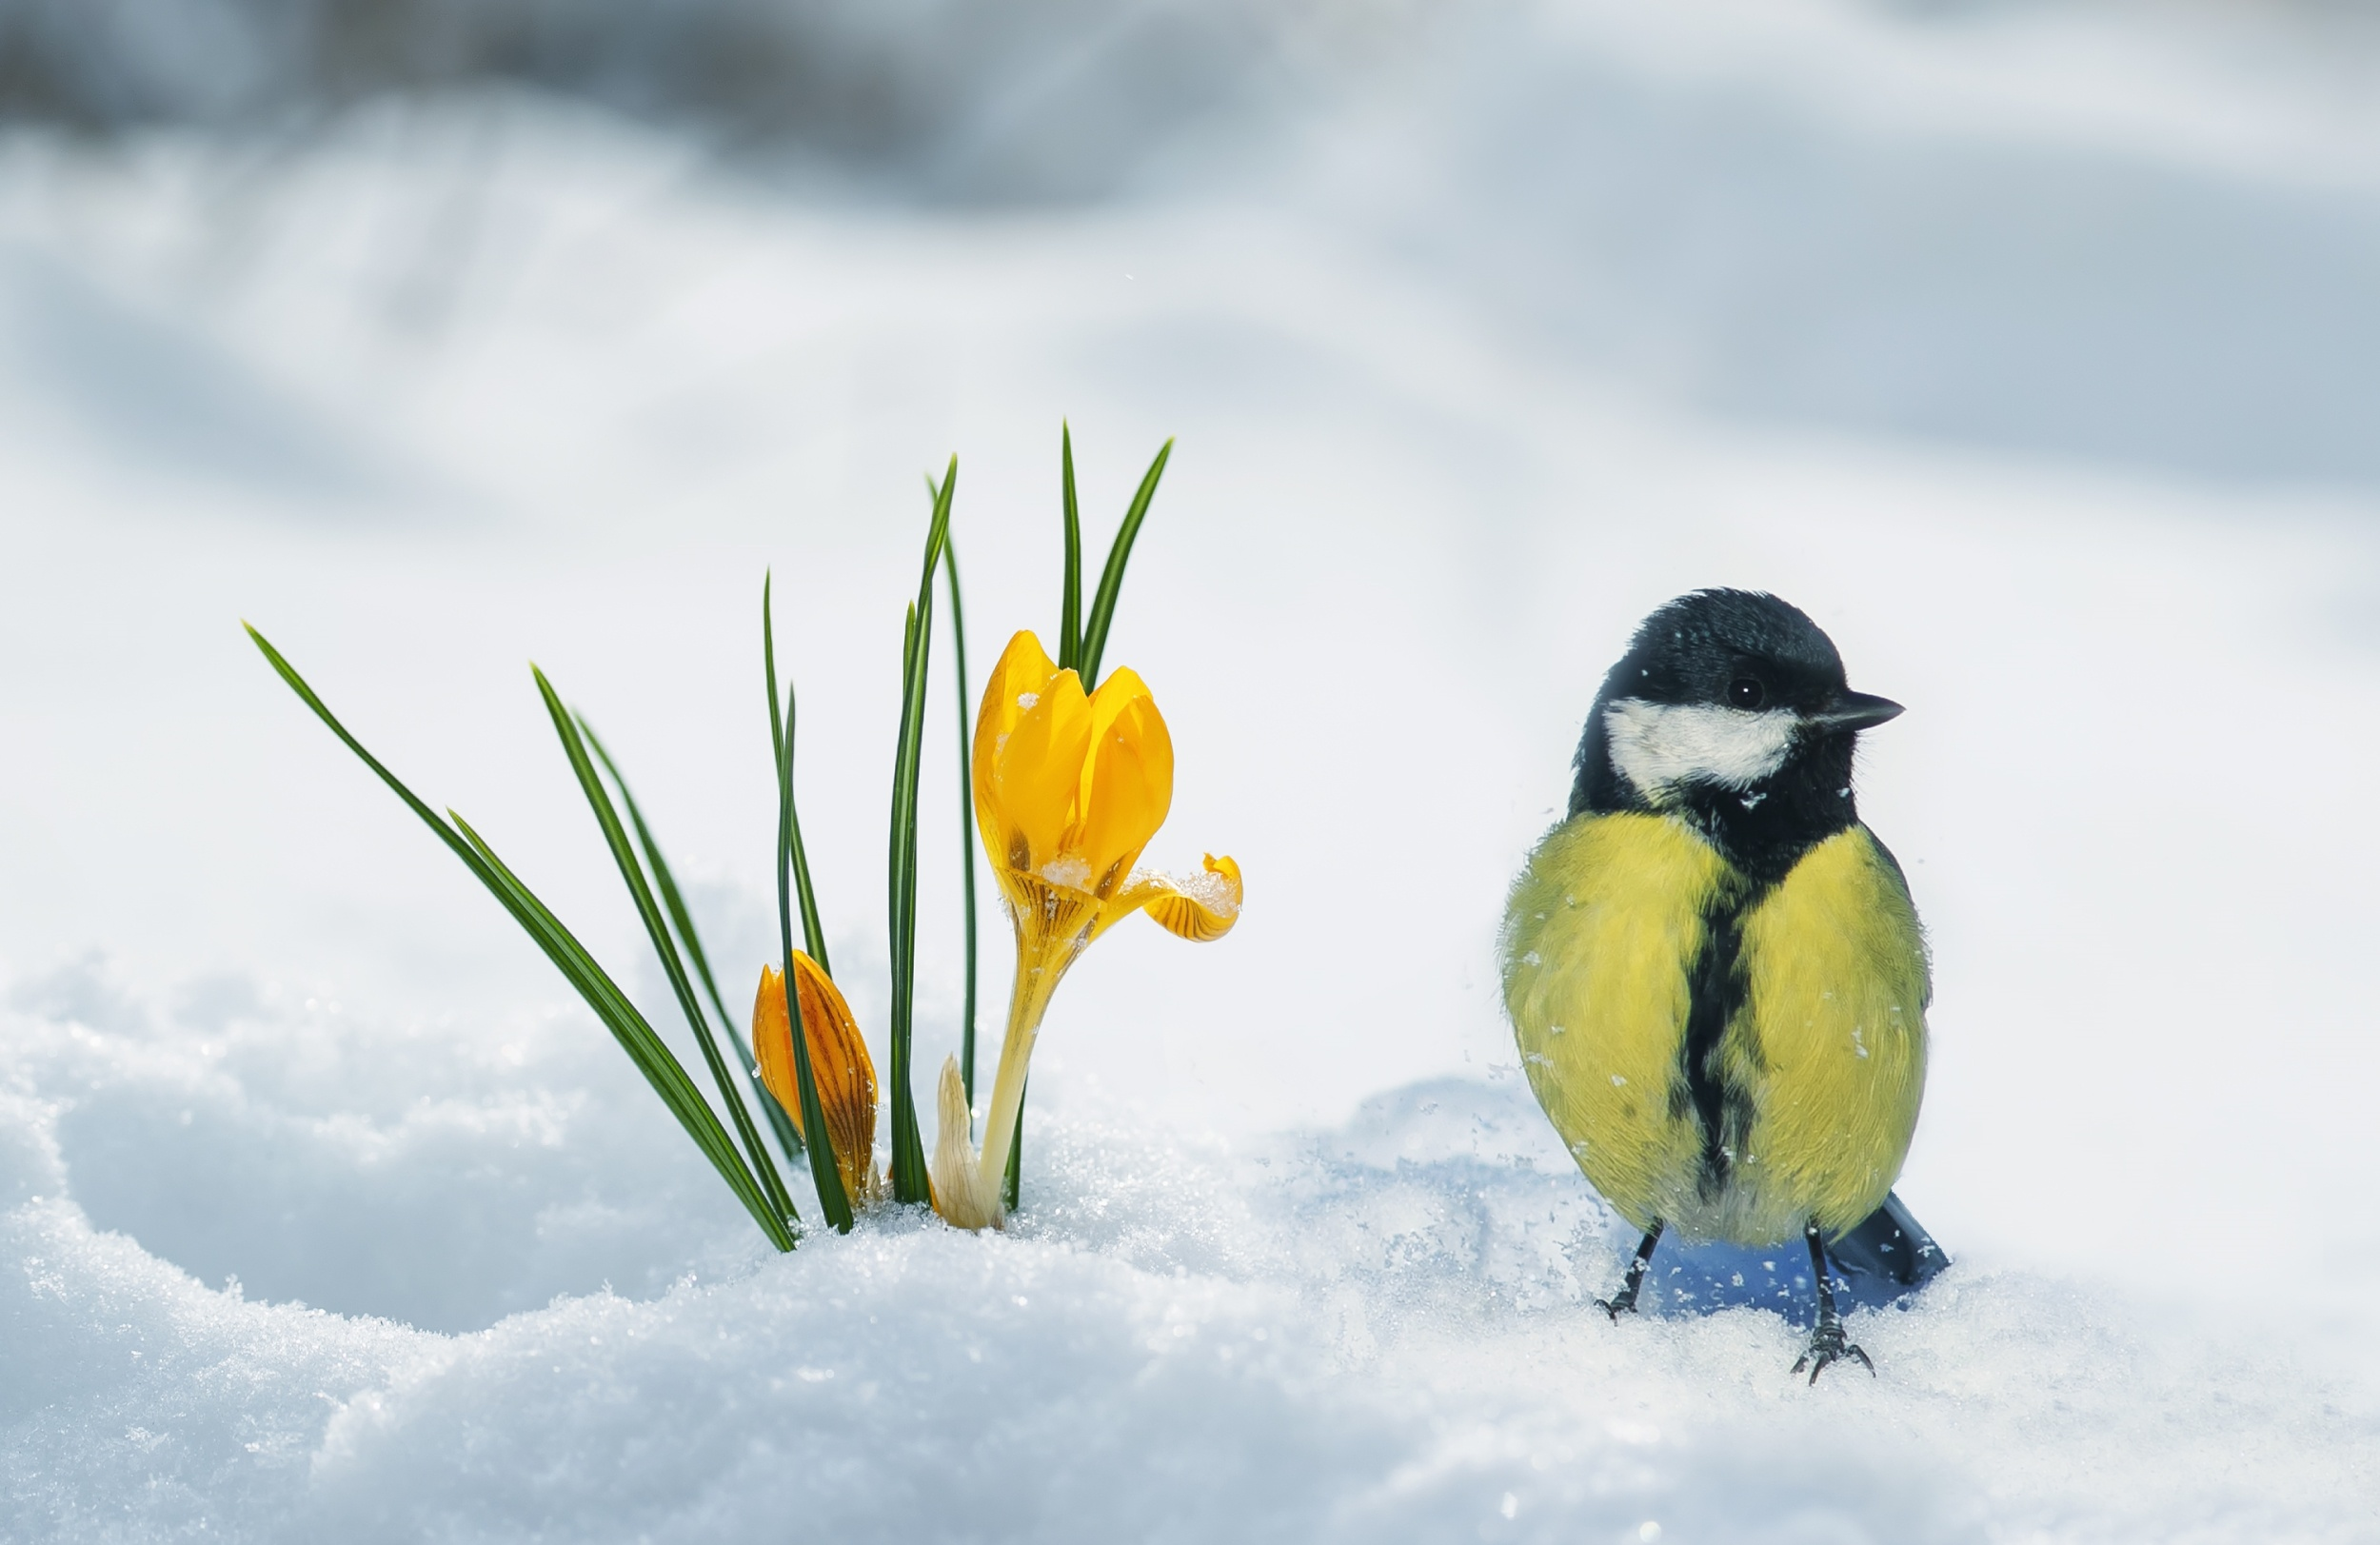 sneg-krokus-vesna-sinitsa-ptitsa.jpg